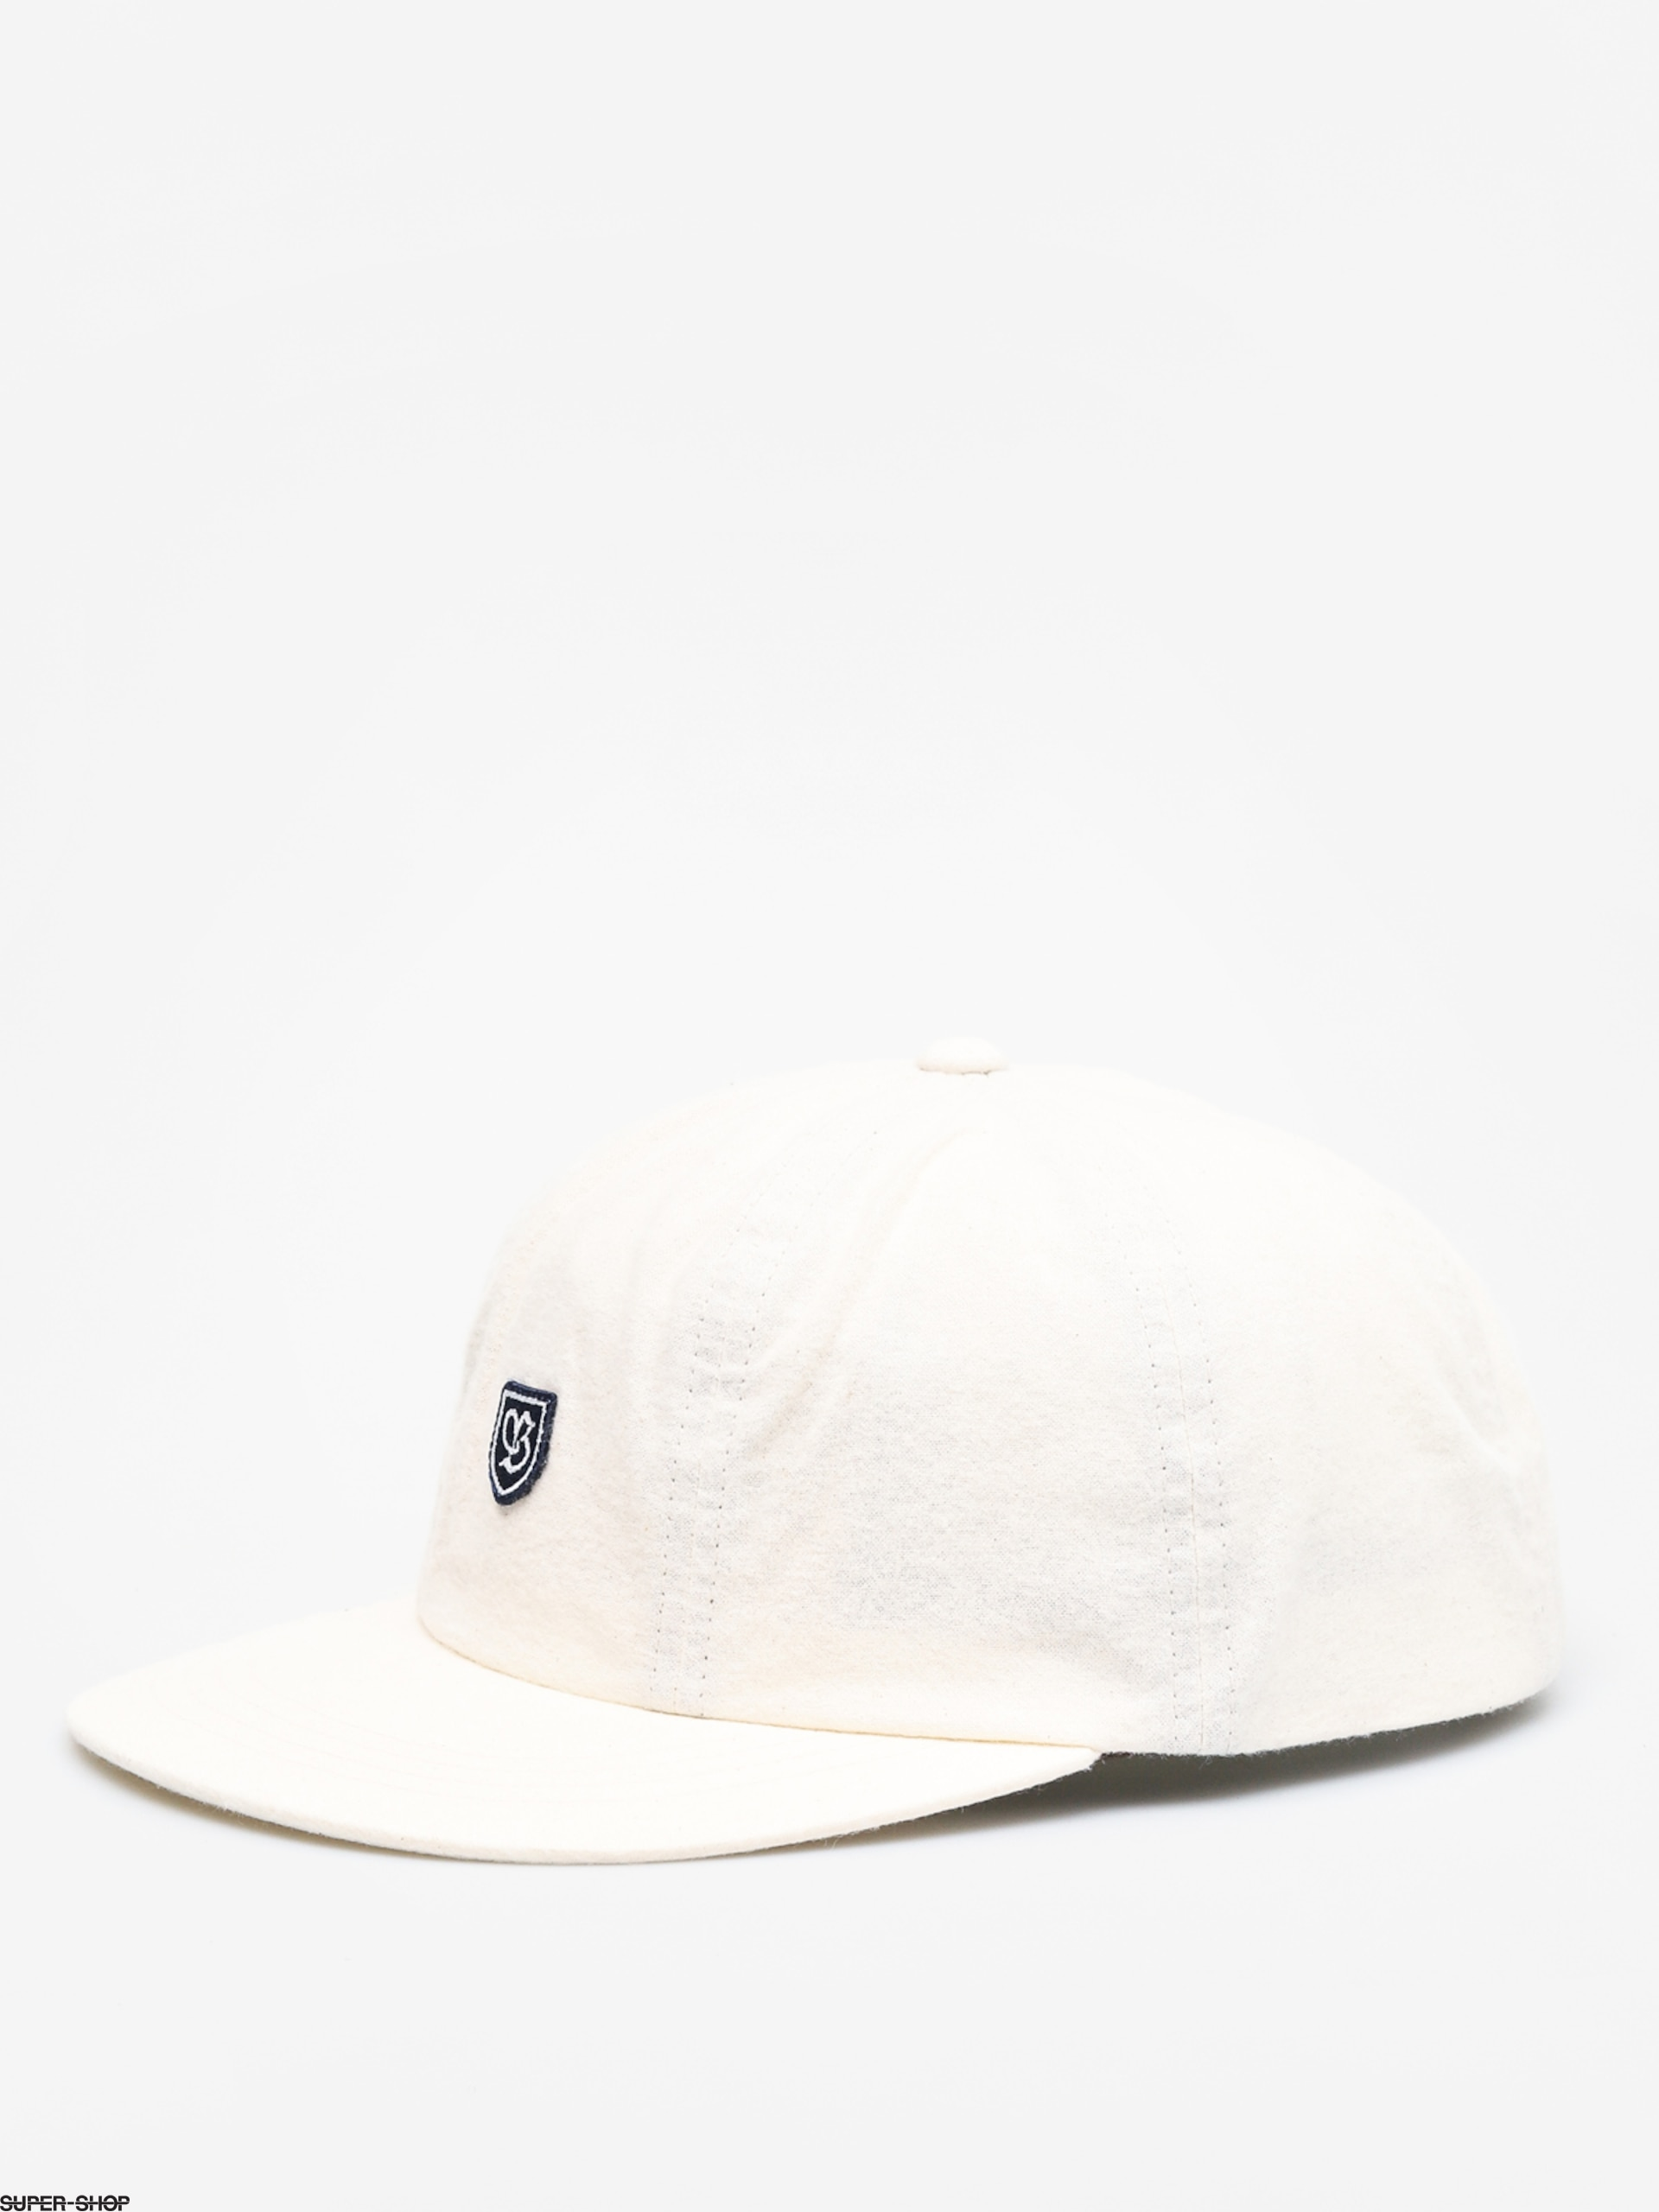 1021540-w1920-brixton-b-shield-iii-zd-cap-off-white.jpg 3b8d24eaa10